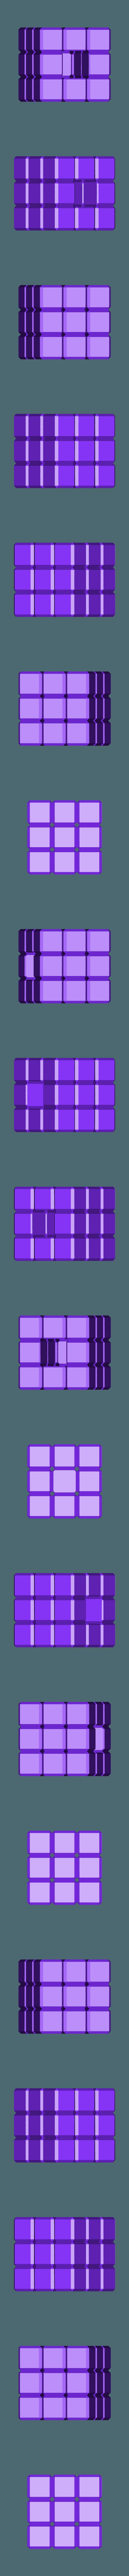 threeBot_Loose.stl Download free STL file Nesting Cubes, Recursive Cubes, Cubes within Cubes • 3D printer template, LGBU